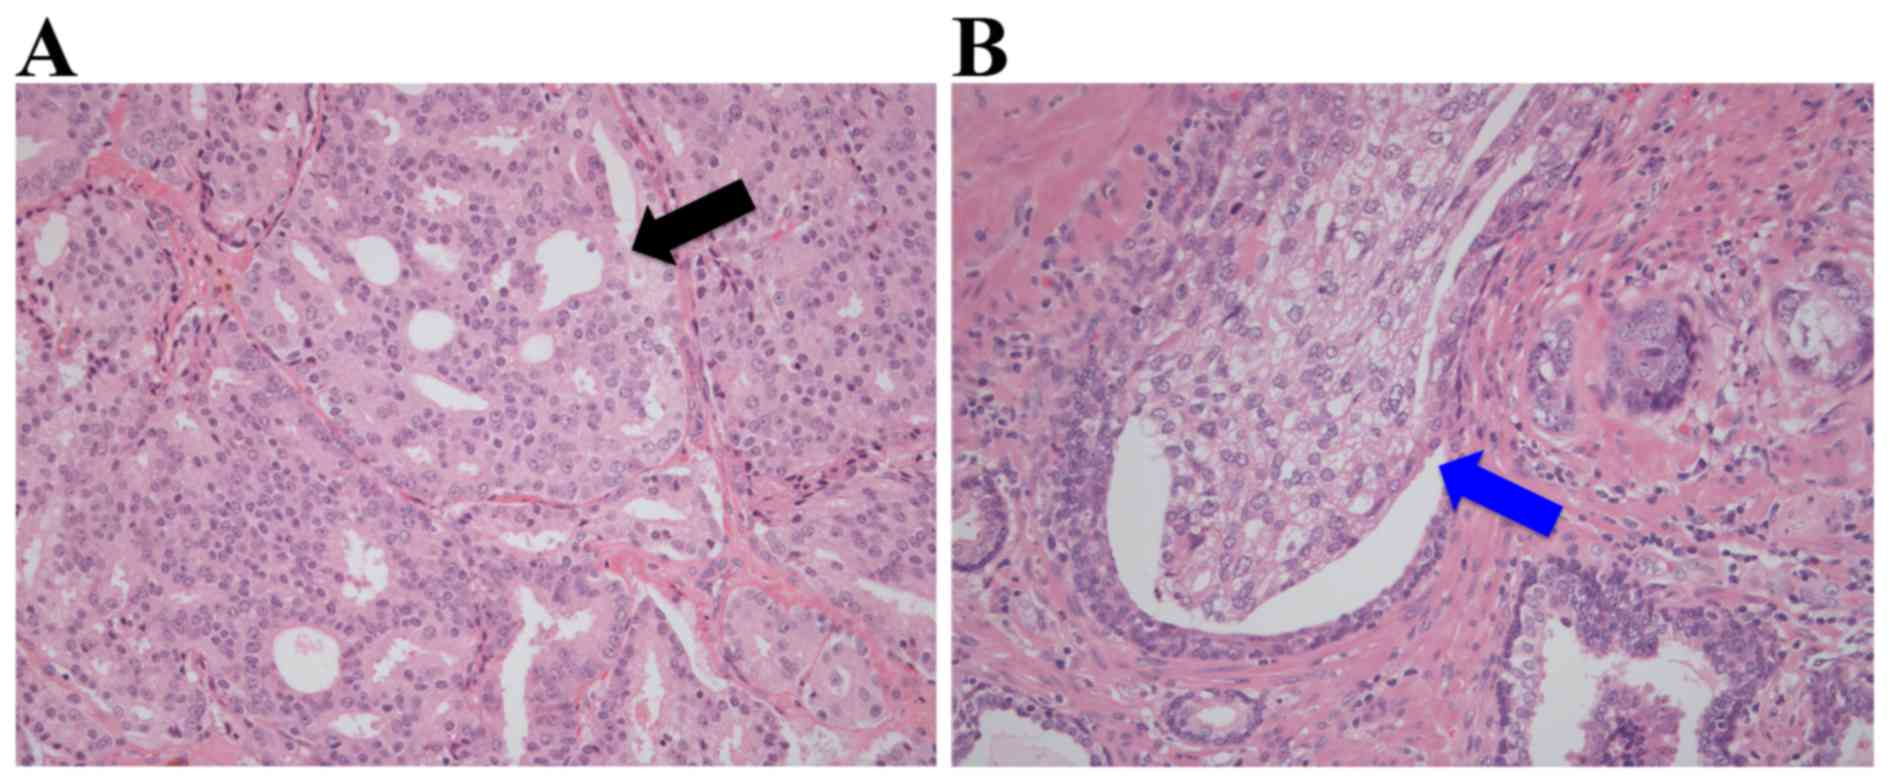 adenocarcinoma de próstata gleason 4 4 80